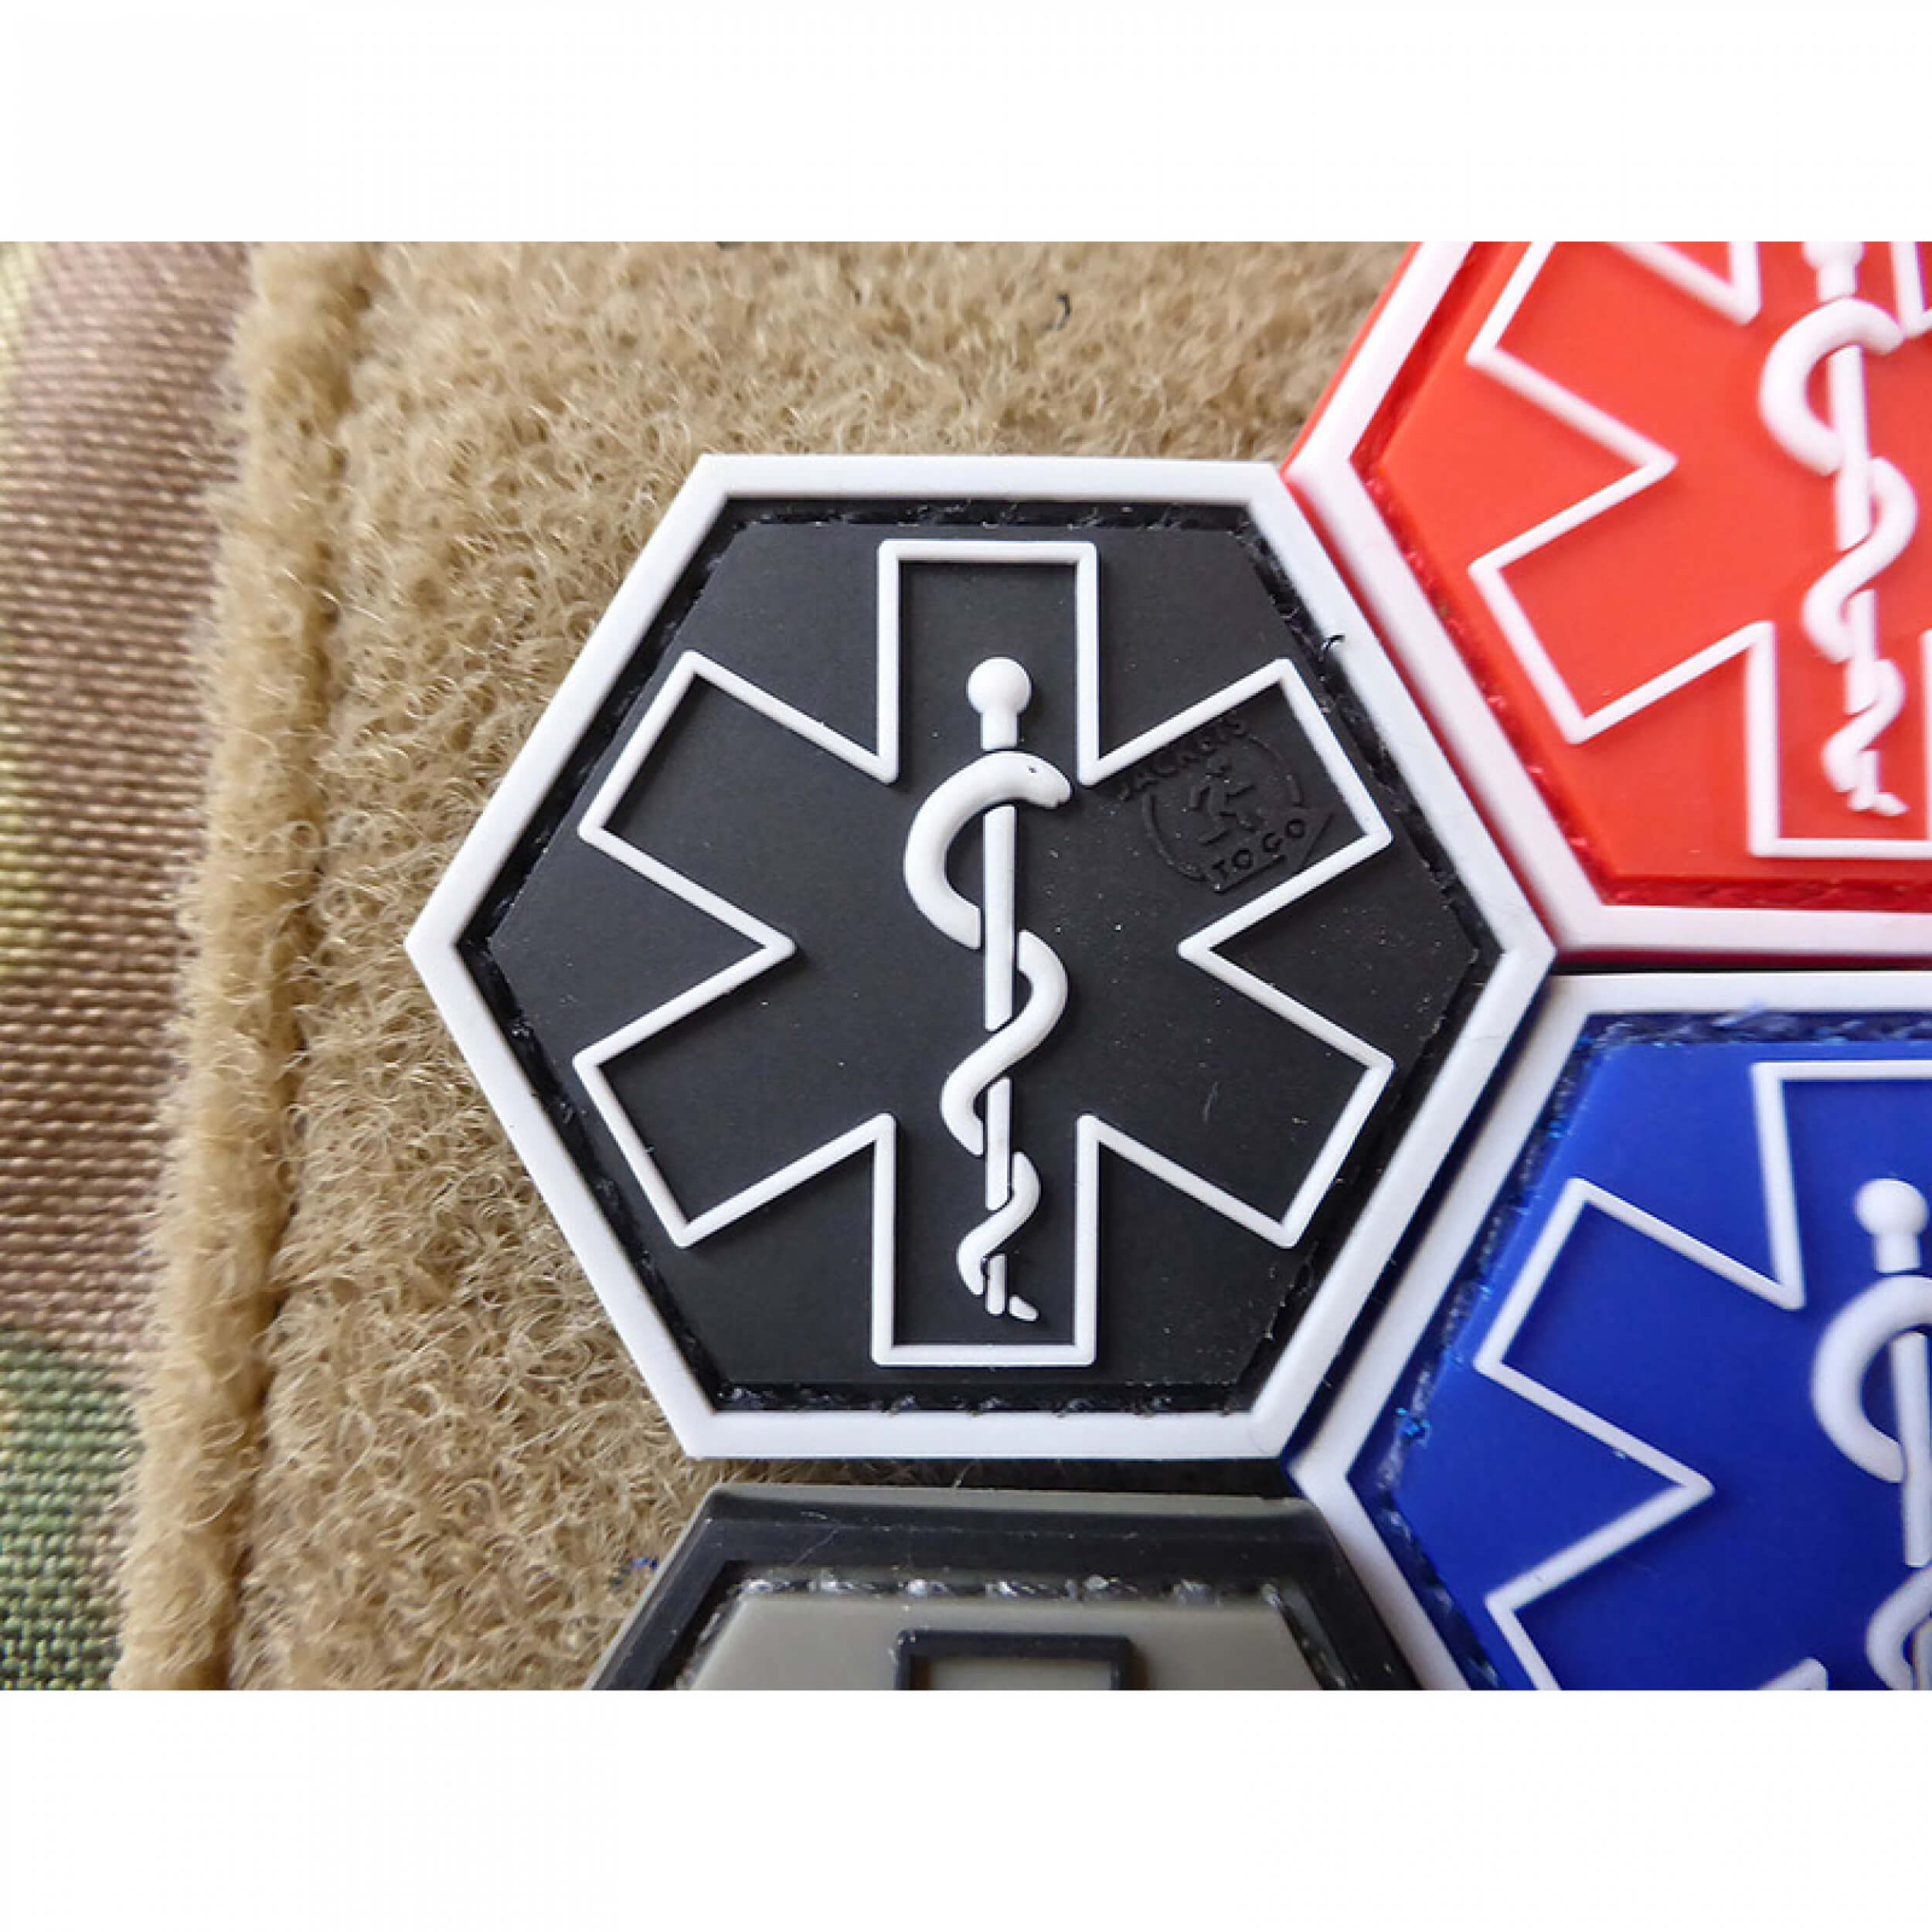 JTG PARAMEDIC, swat Hexagon Patch  (gb)